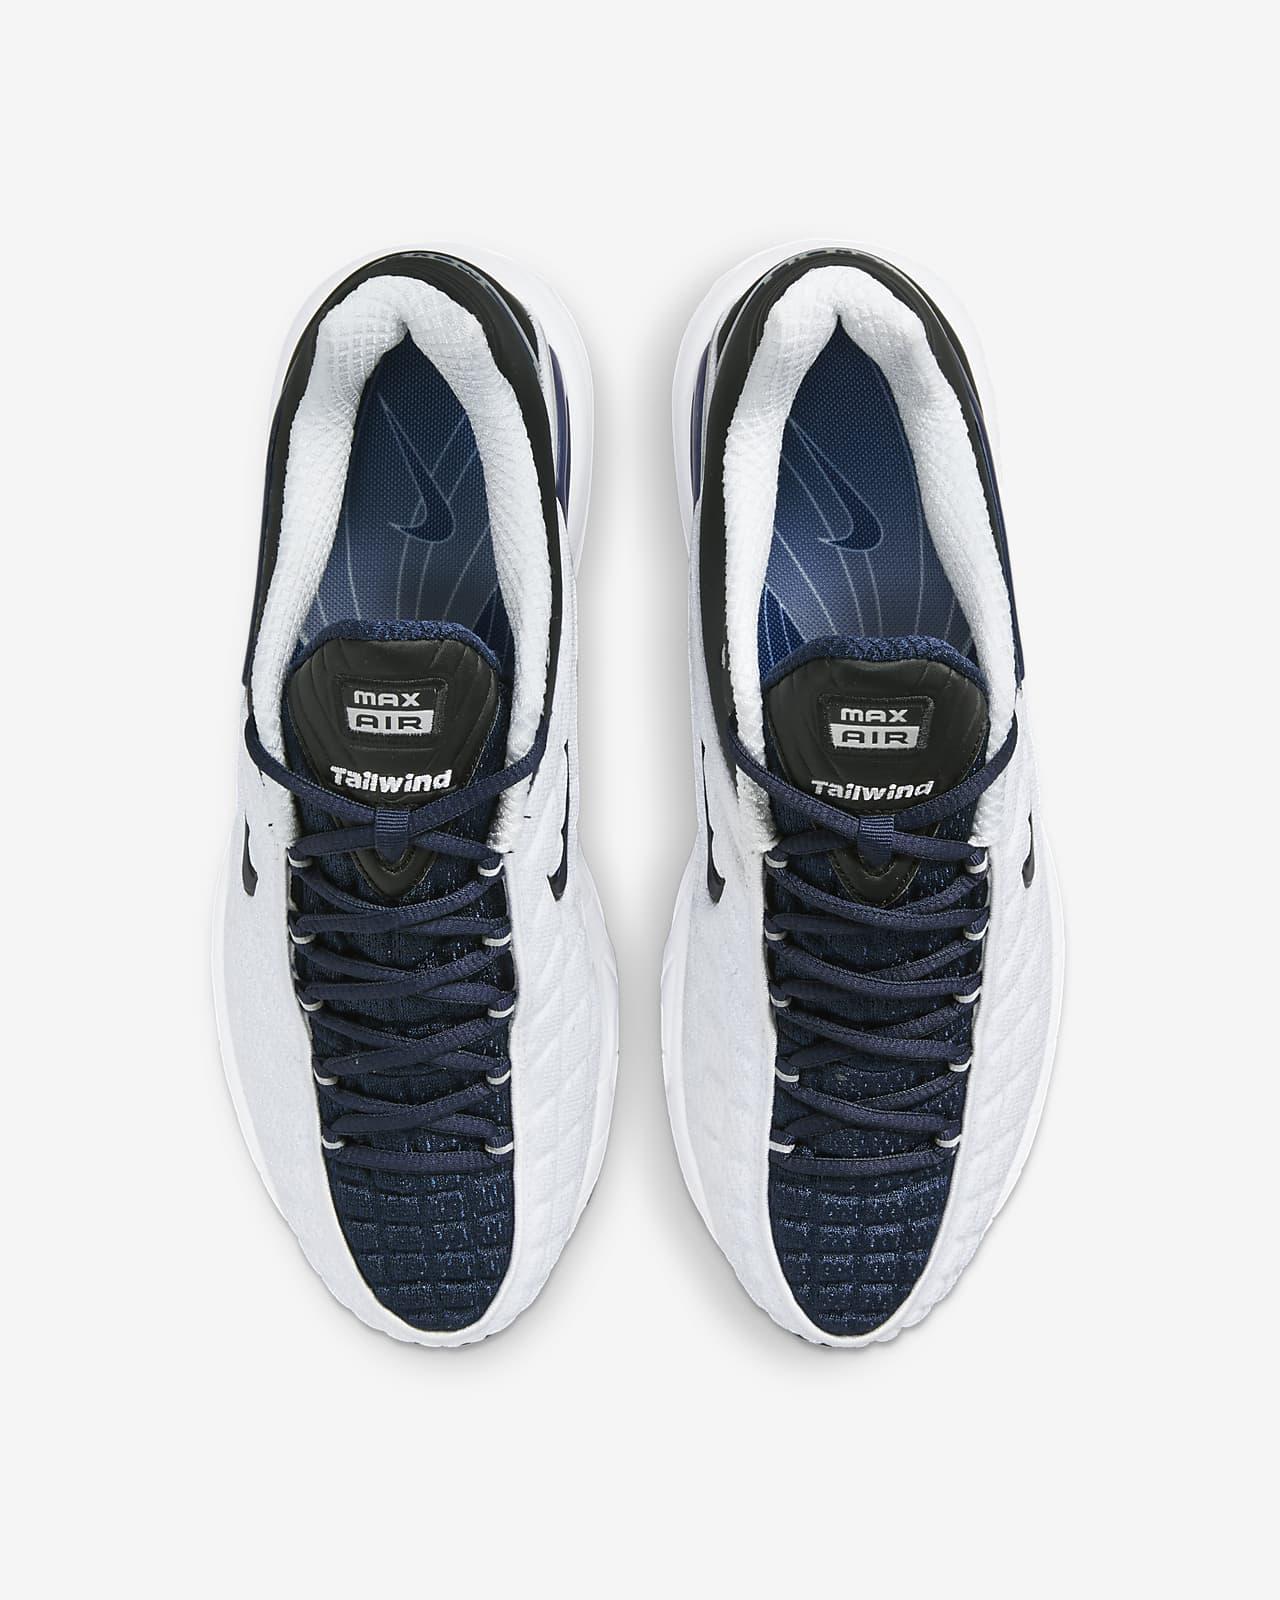 Nike Air Max Tailwind V SP Men's Shoe. Nike LU